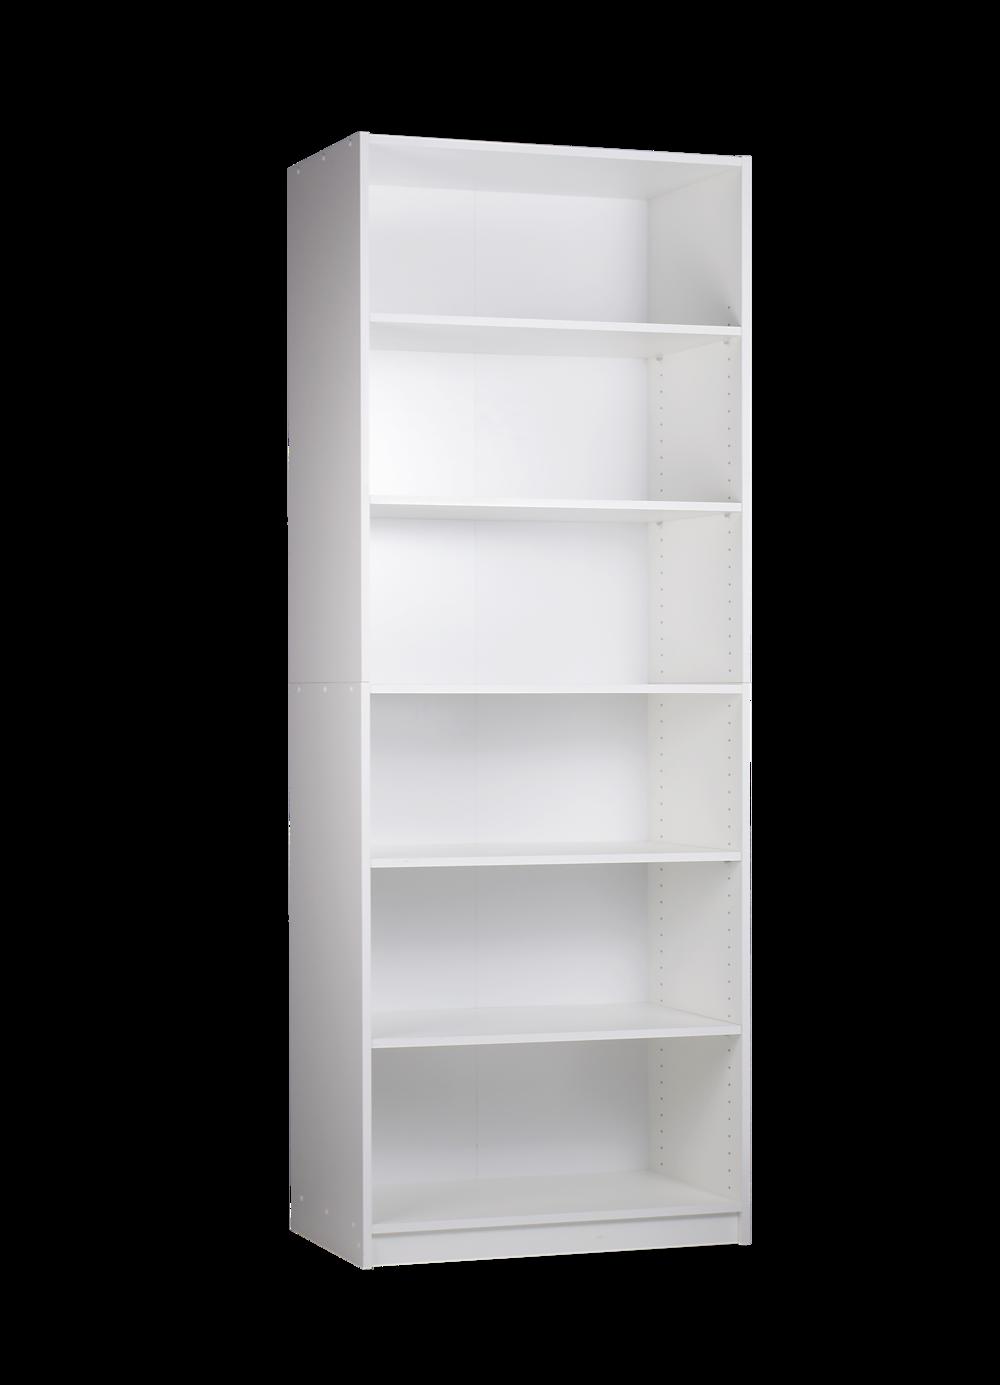 EXC-750 Shelf.png